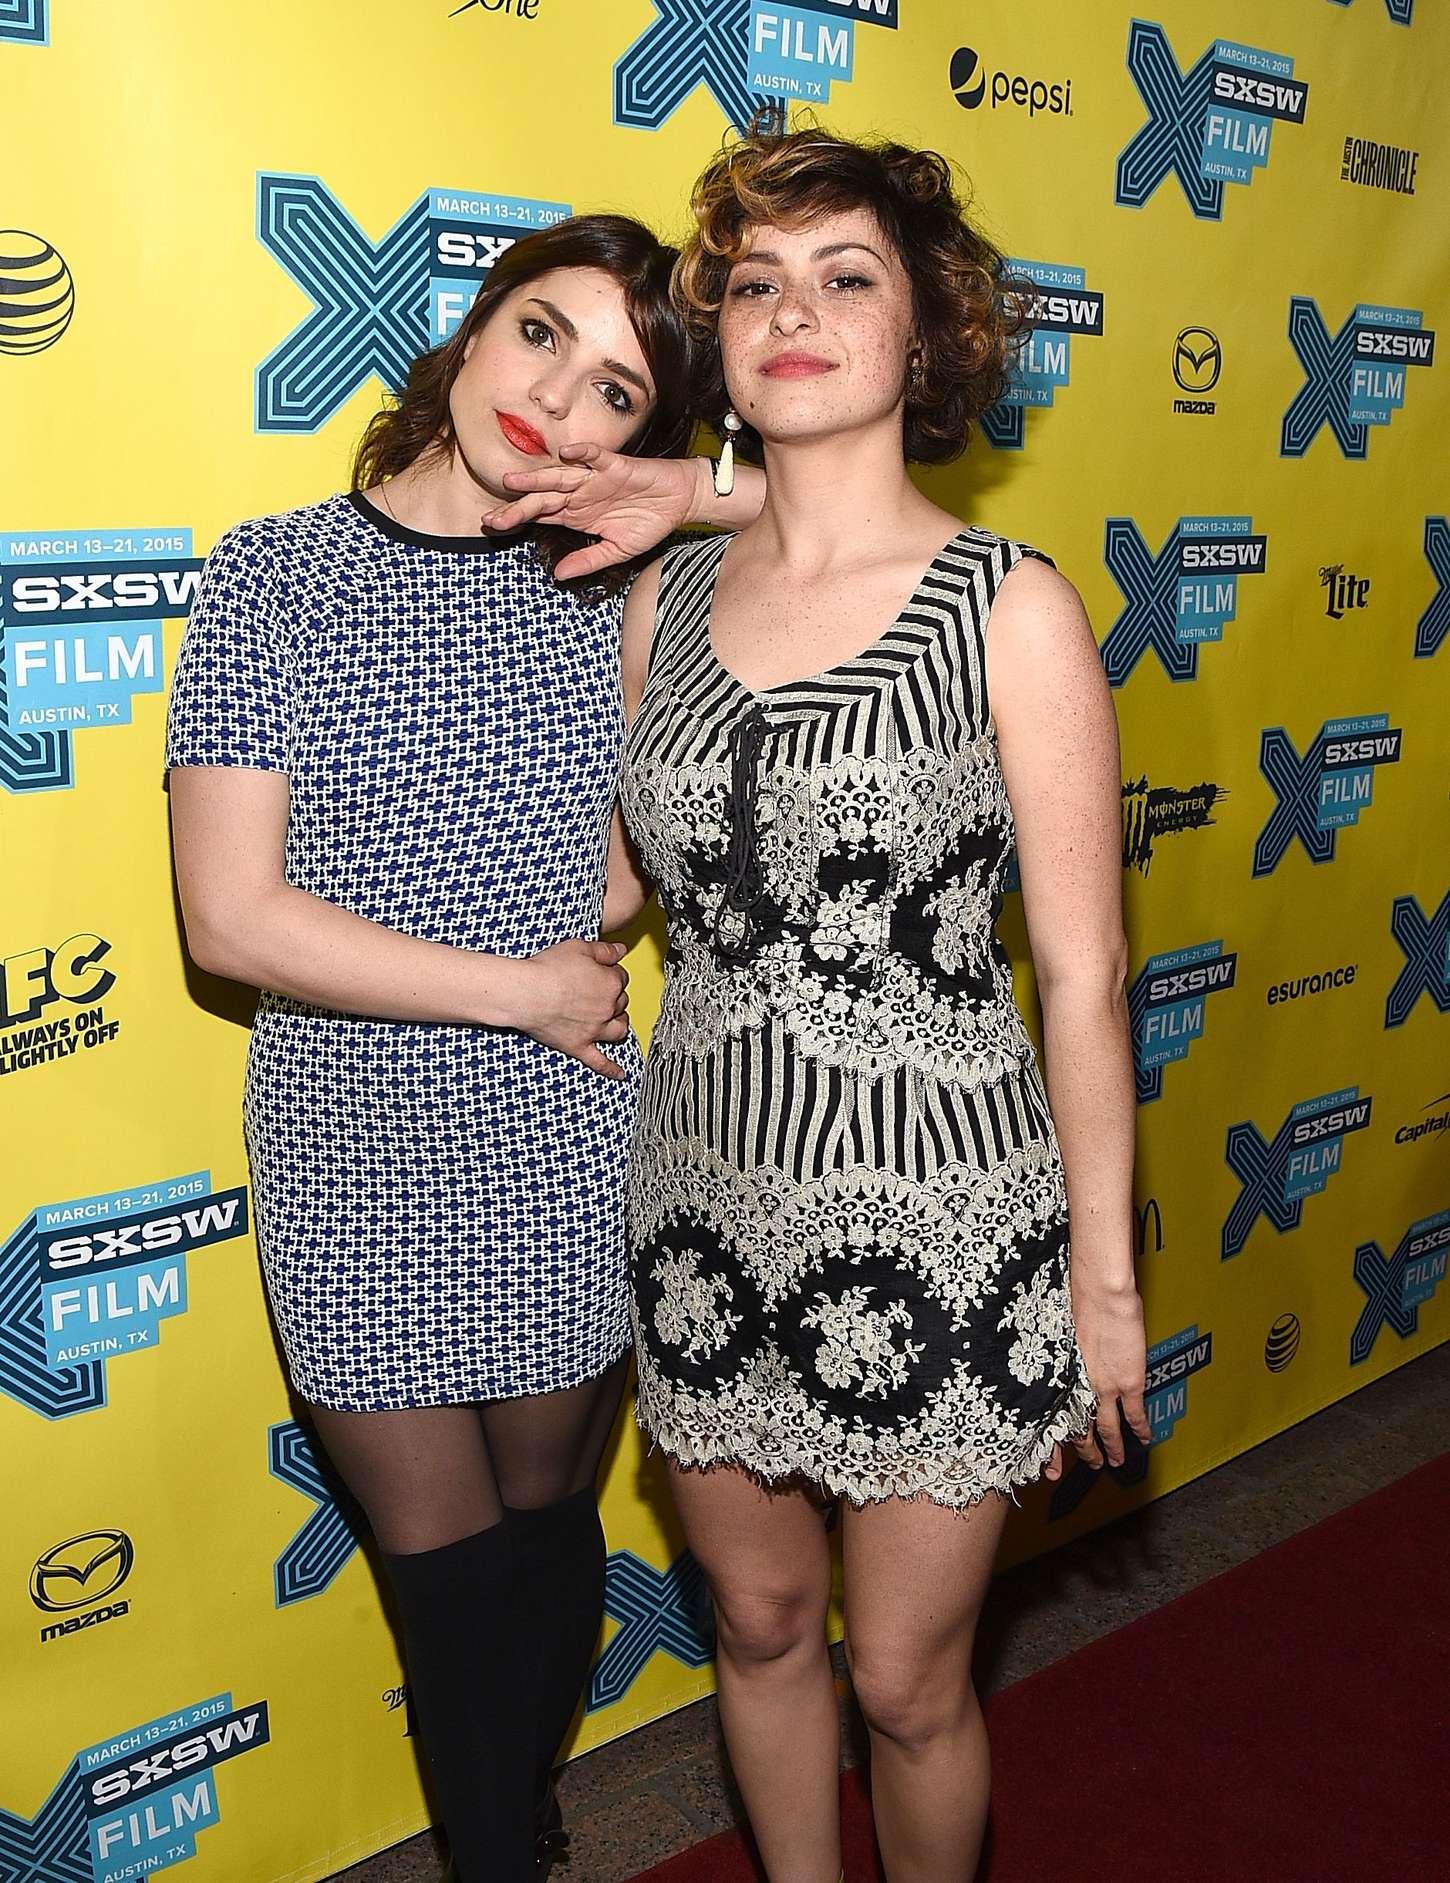 Alia Shawkat The Final Girls Premiere at SXSW in Austin